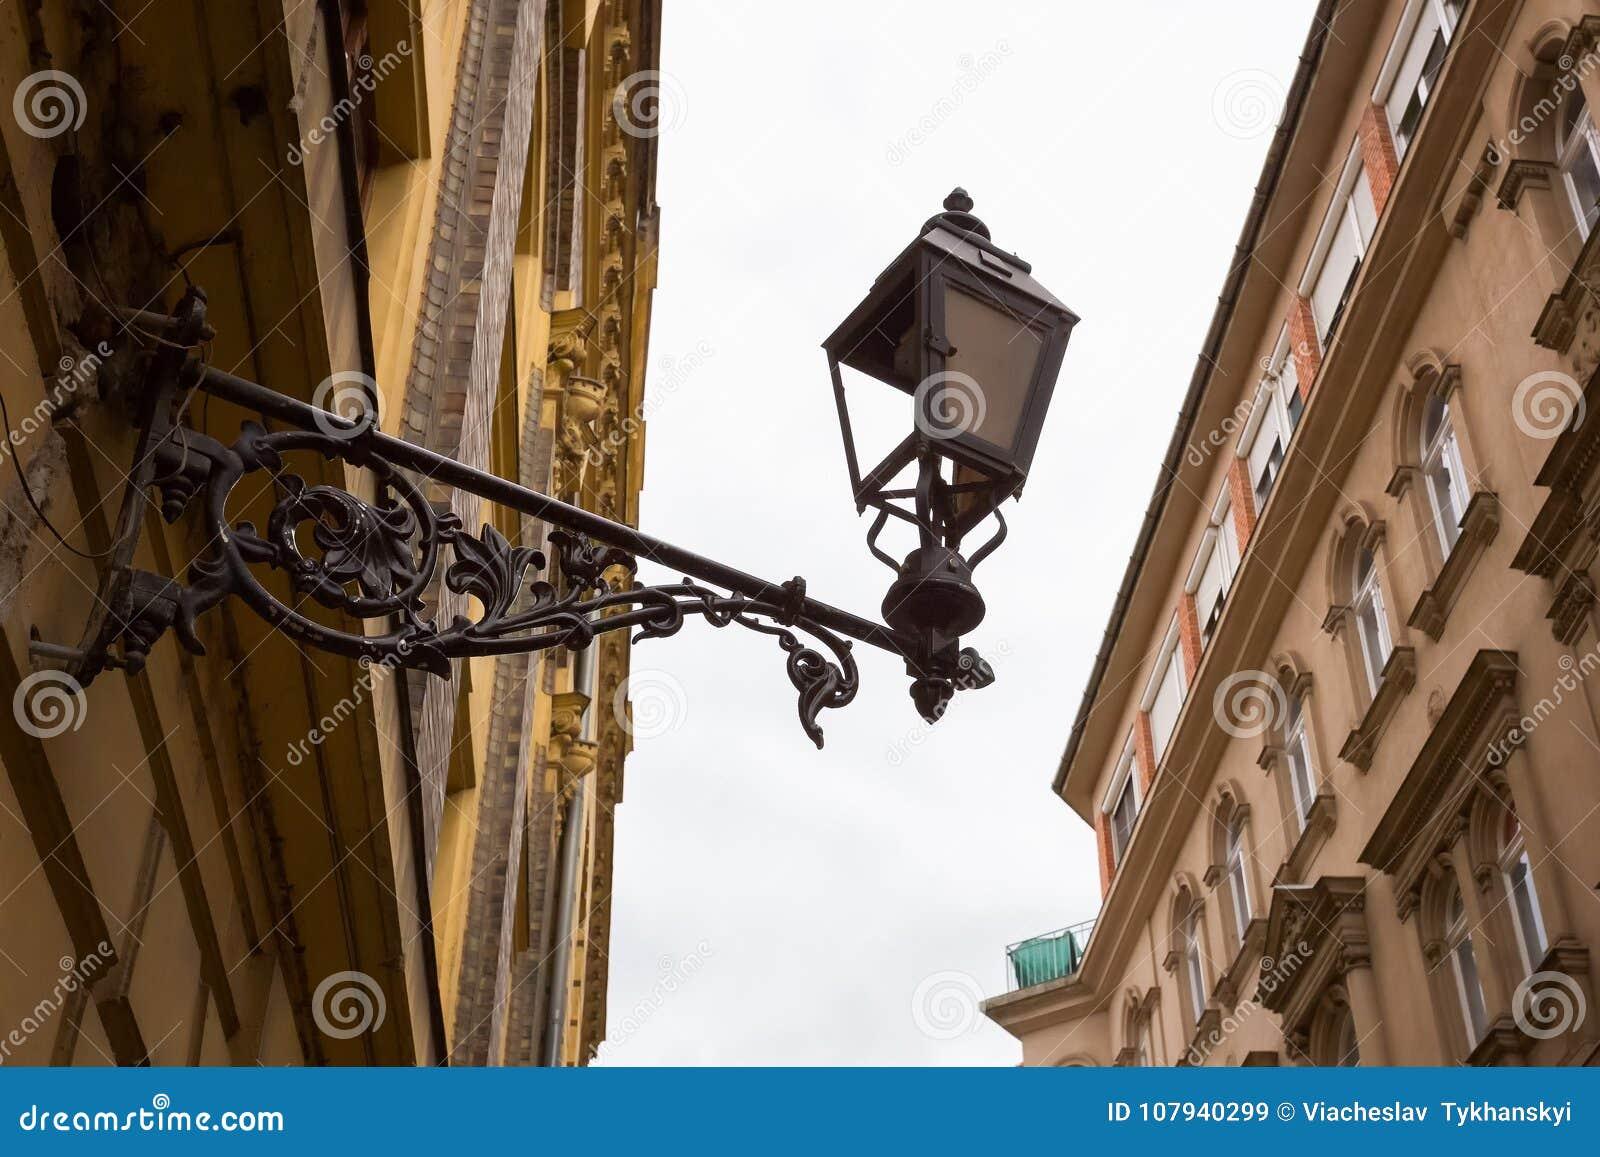 Lanterna que pendura na parede da casa